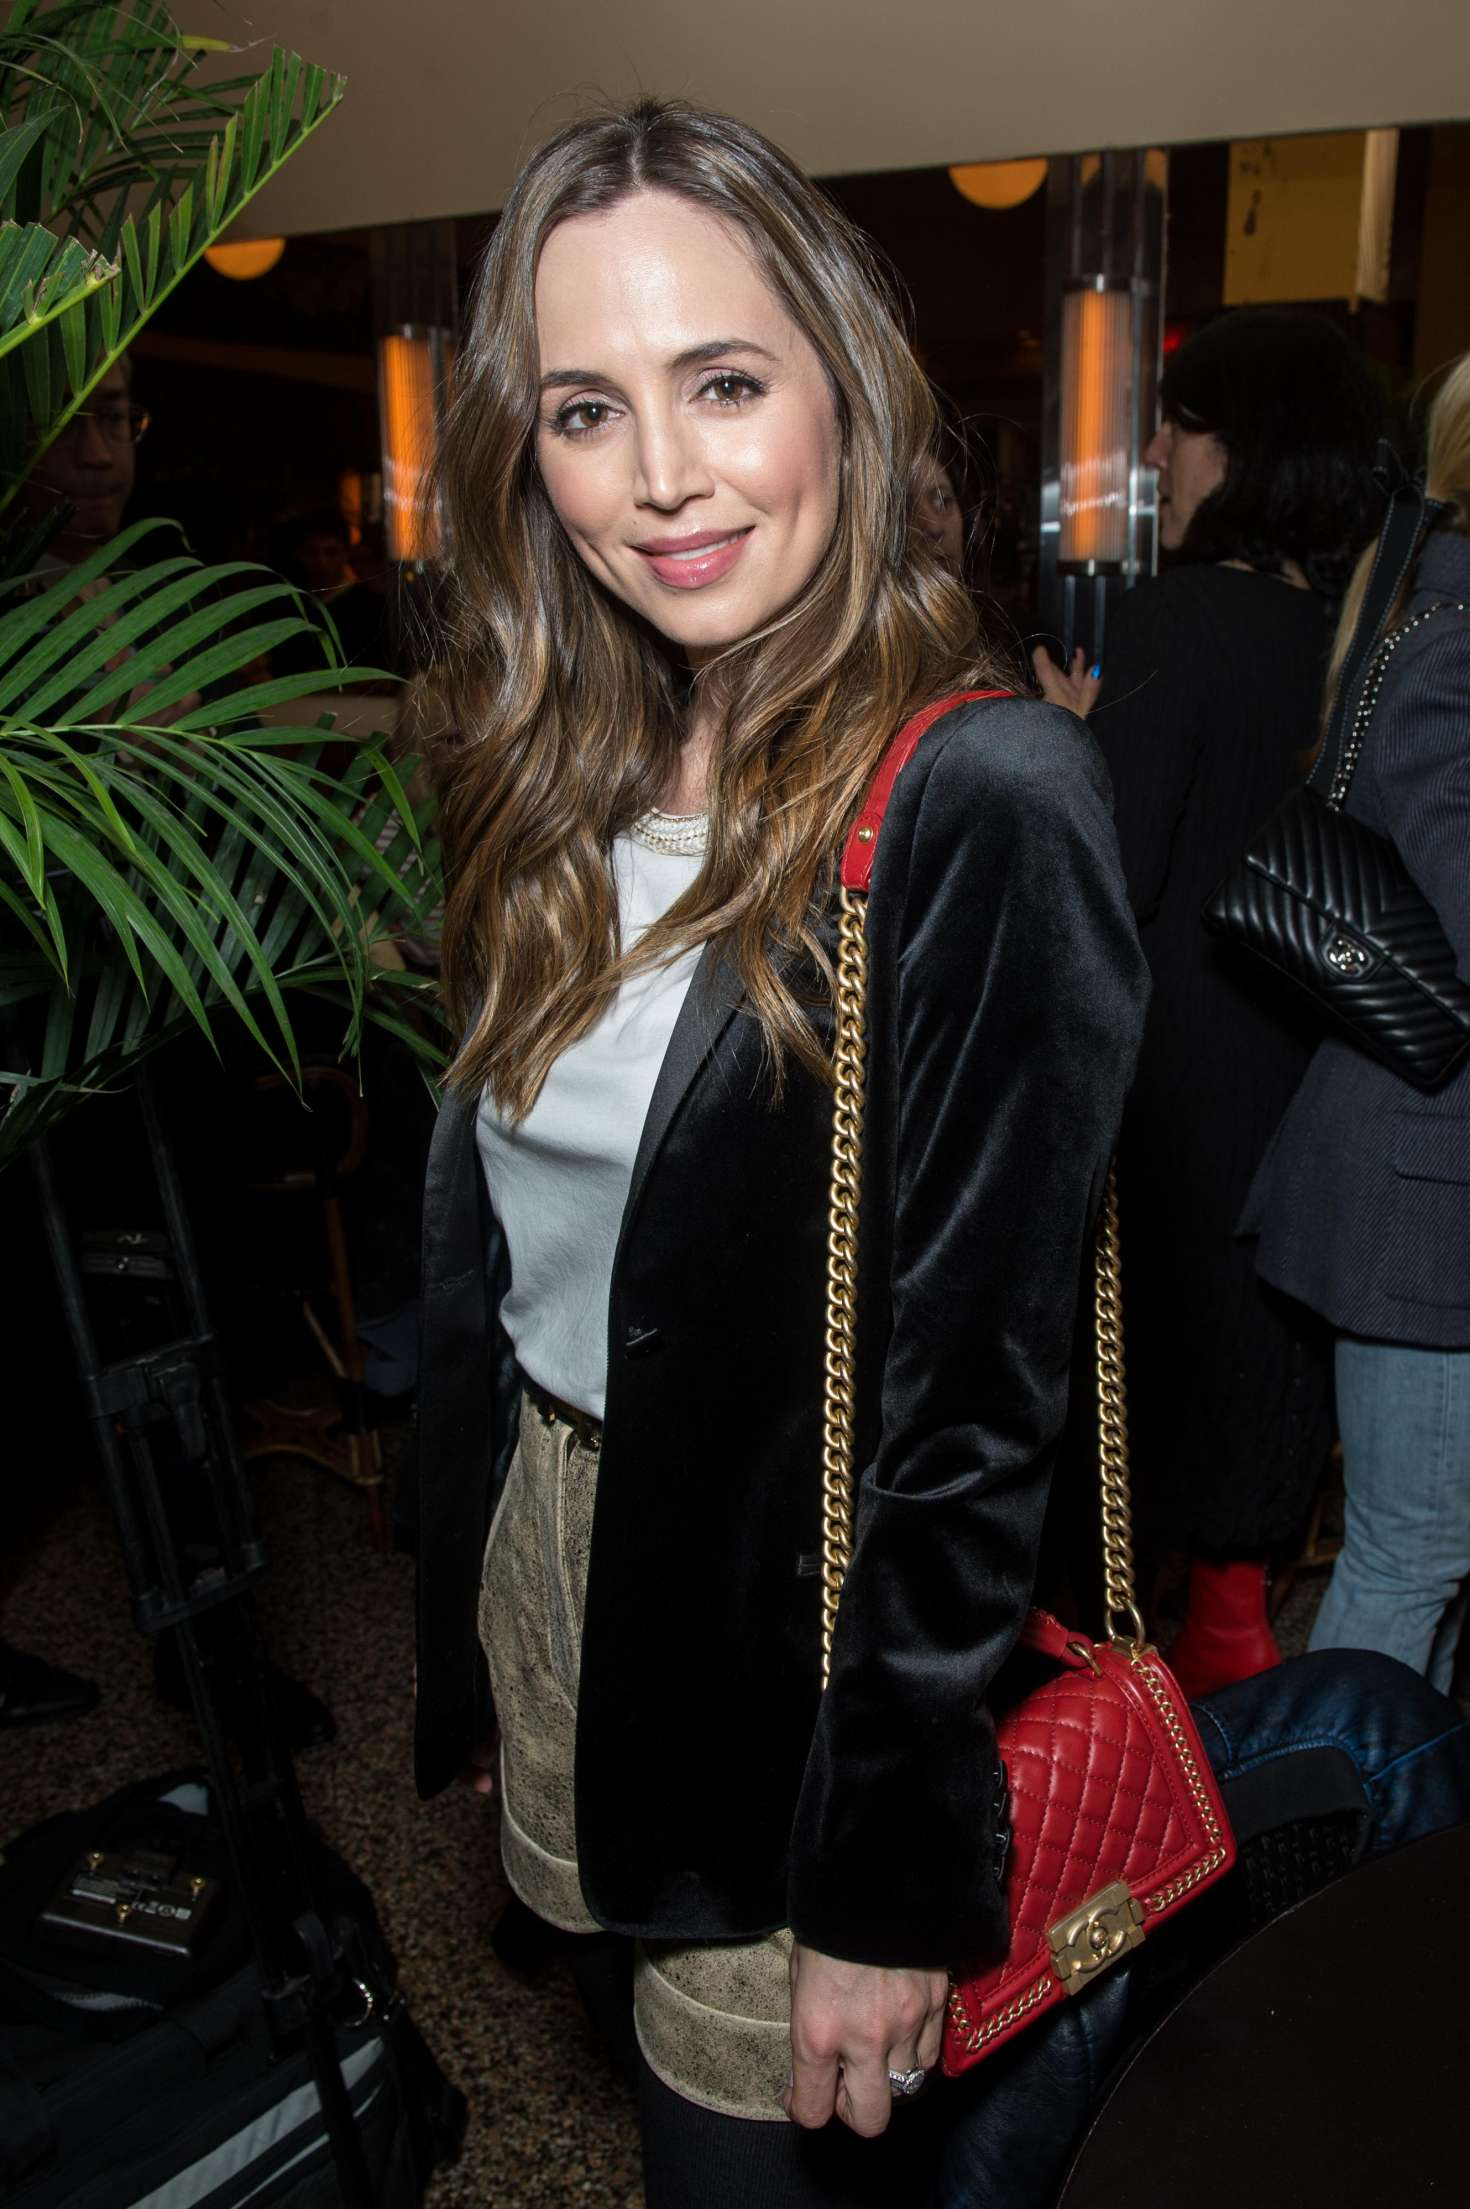 Eliza Dushku 2018 : Eliza Dushku: Chanel x Tribeca Film Festival Womens Filmmaker Luncheon -15